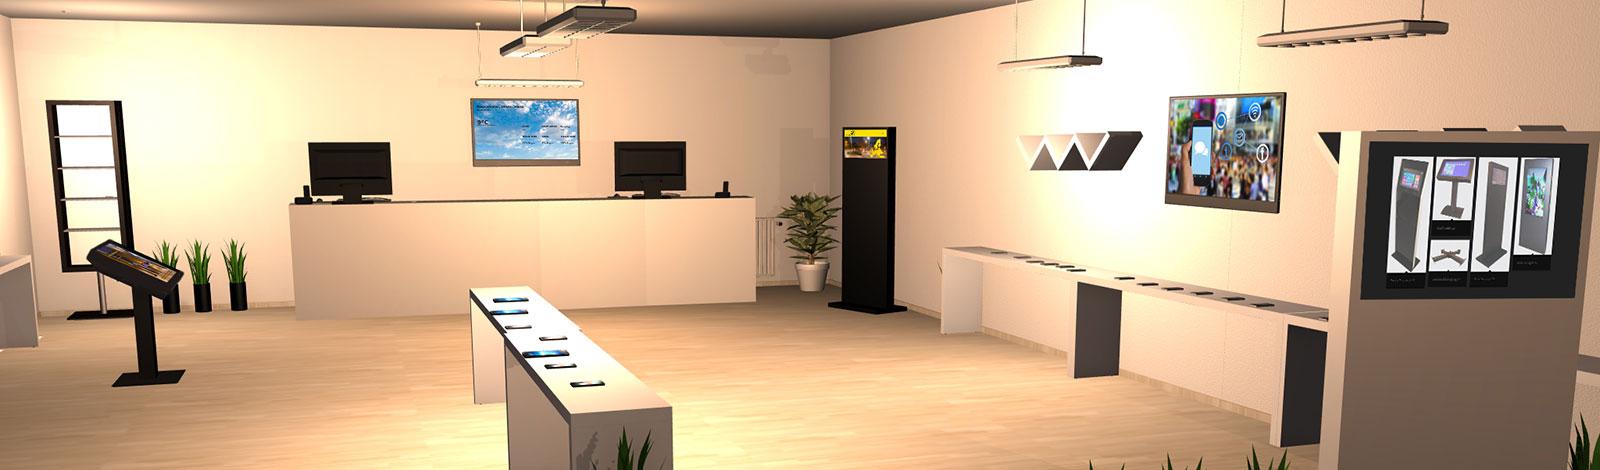 verkausraum-mit-multiscreens-2015-09-08_14-58-29